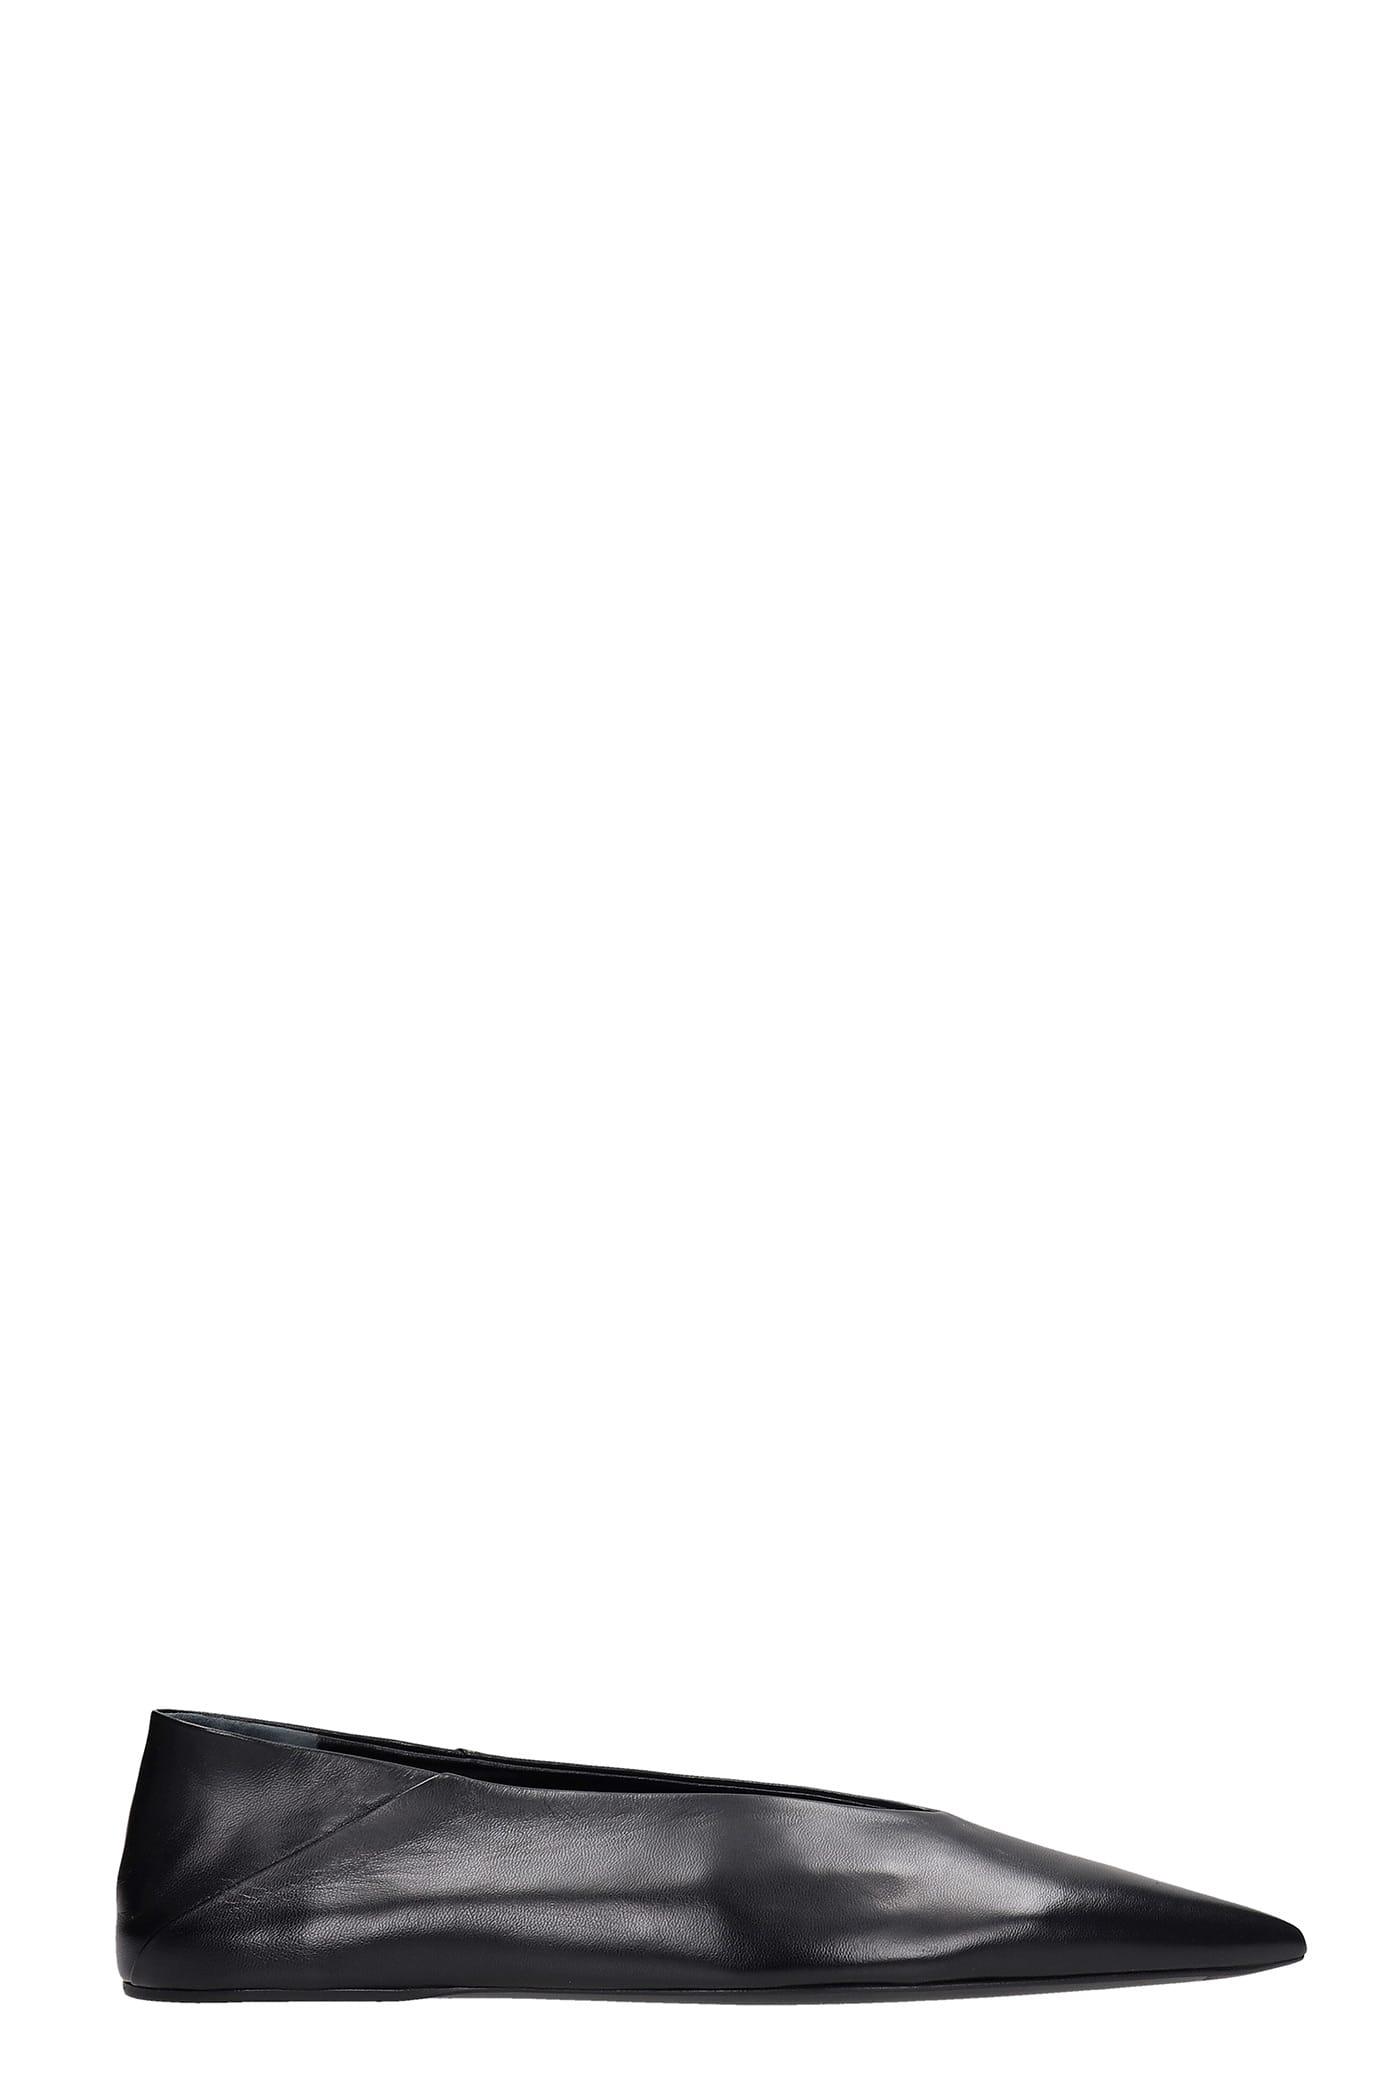 Buy Jil Sander Ballet Flats In Black Leather online, shop Jil Sander shoes with free shipping